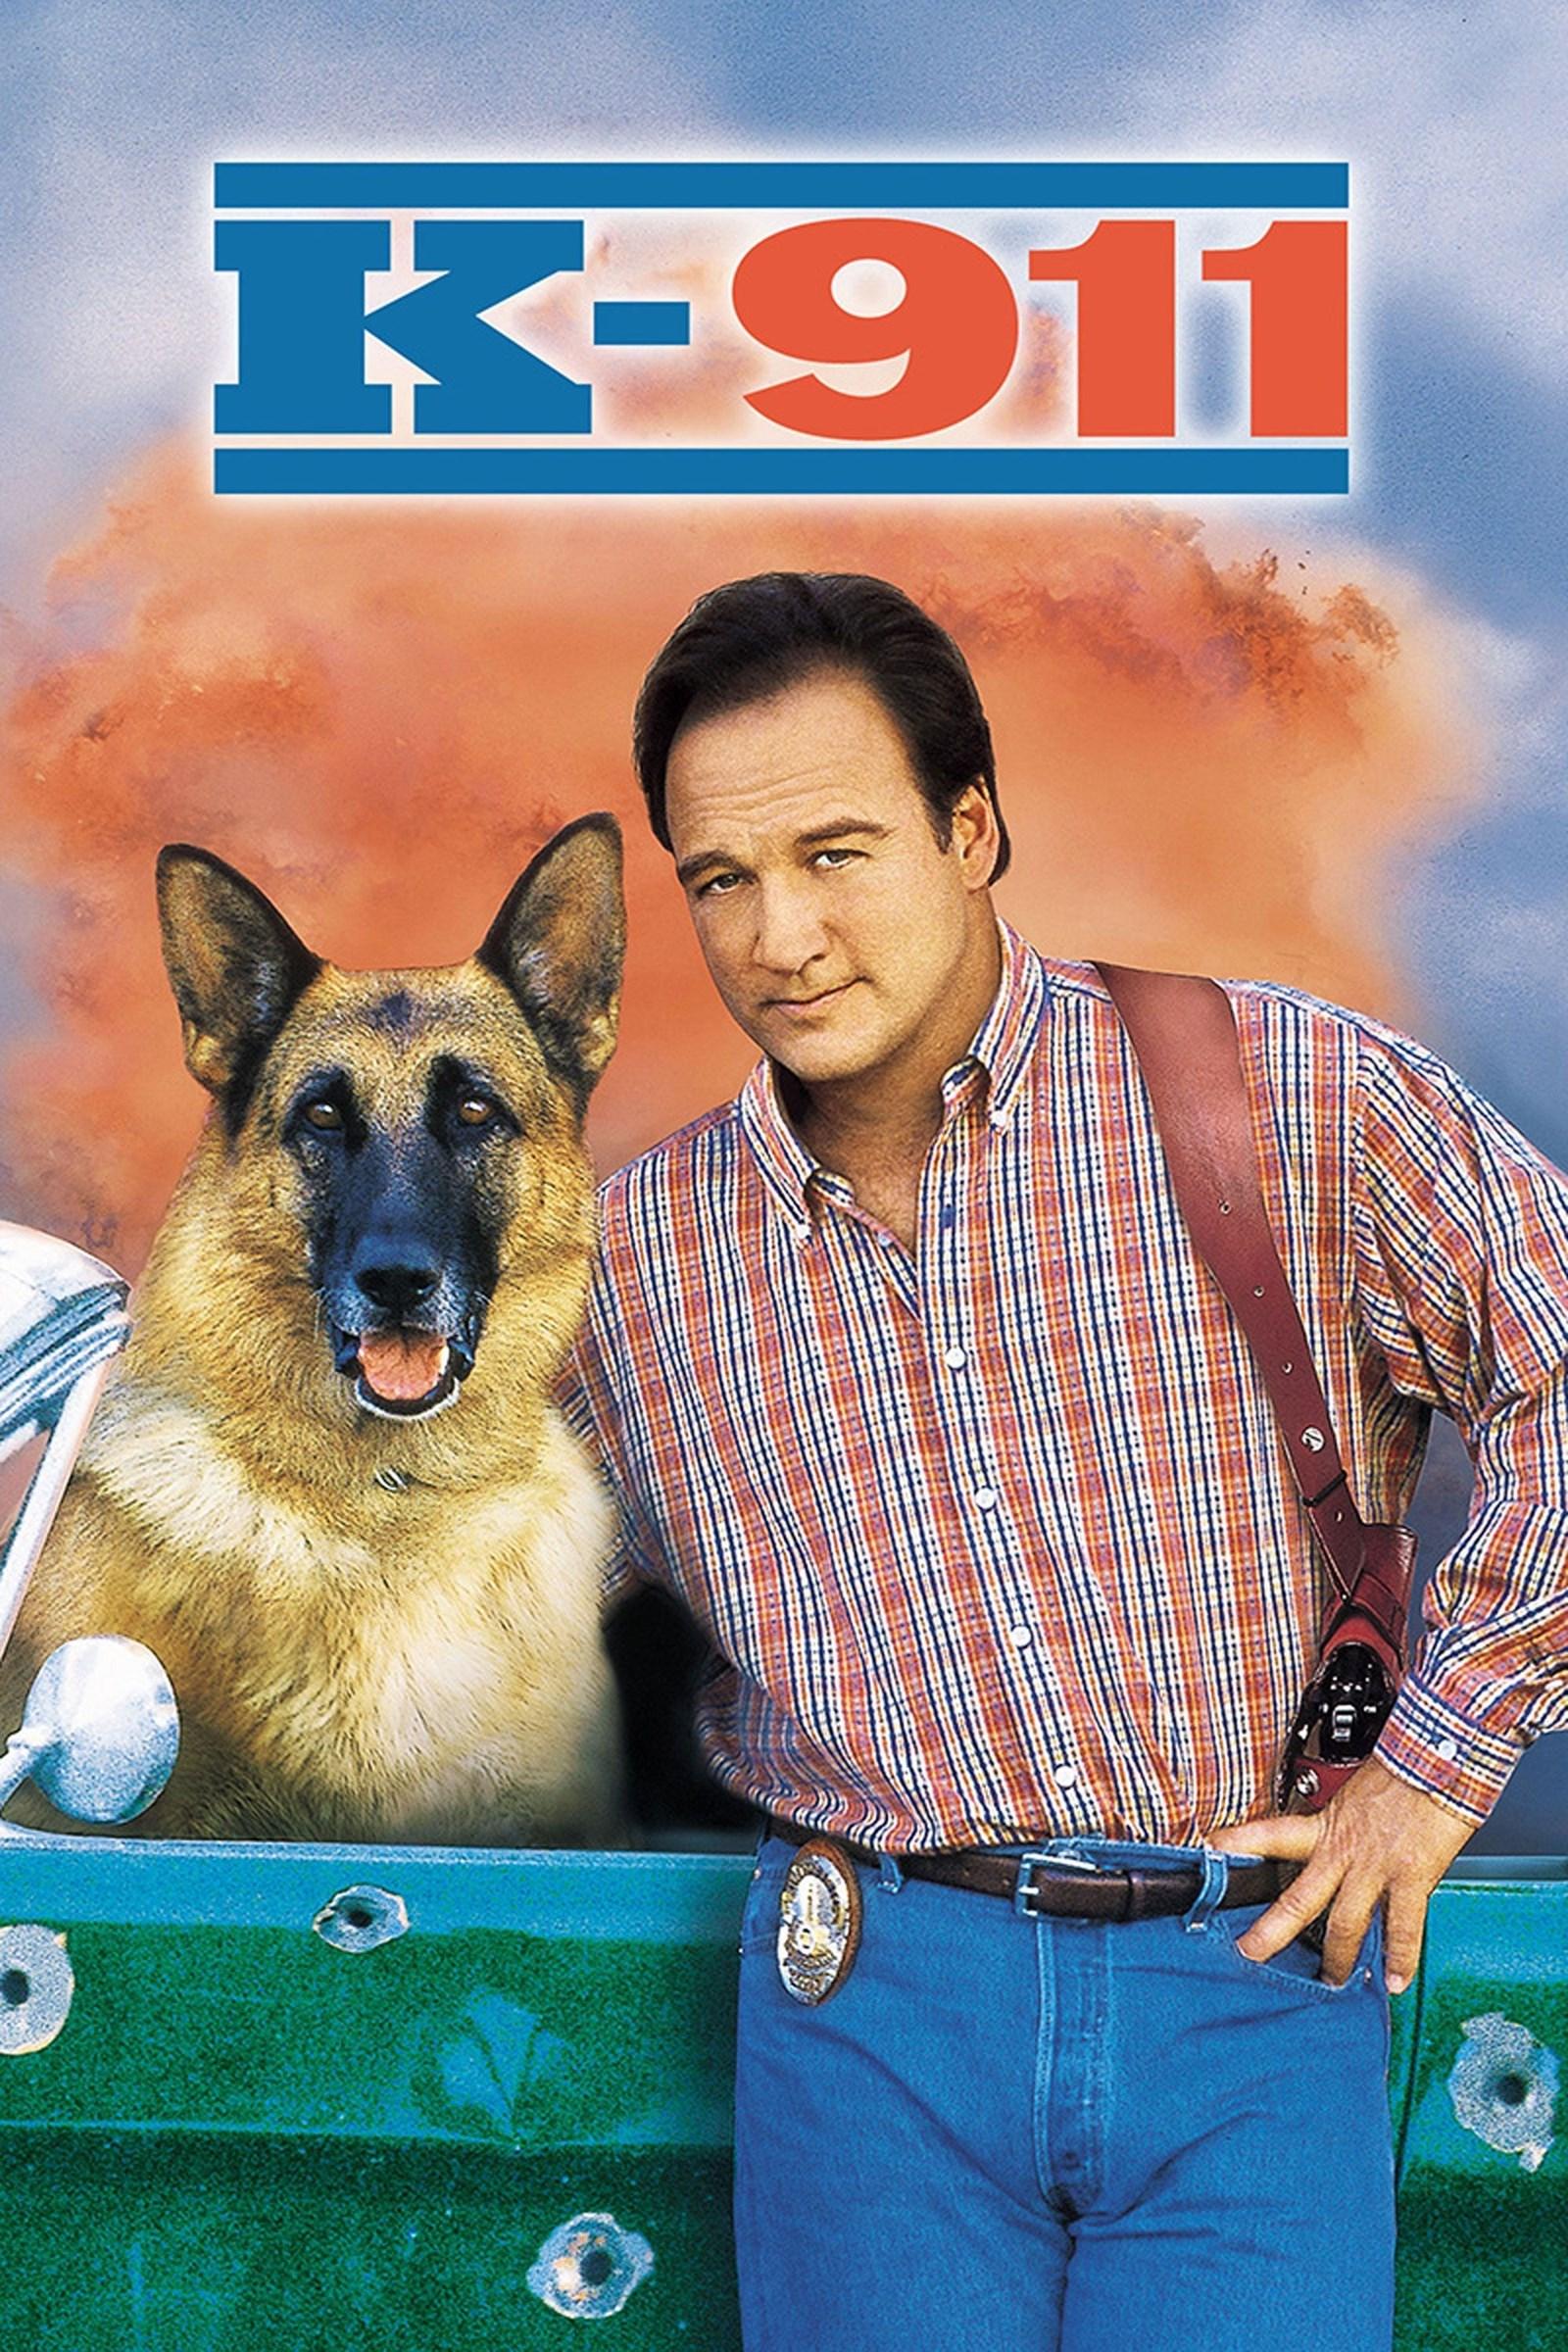 مشاهدة فيلم K-911 (1999) مترجم